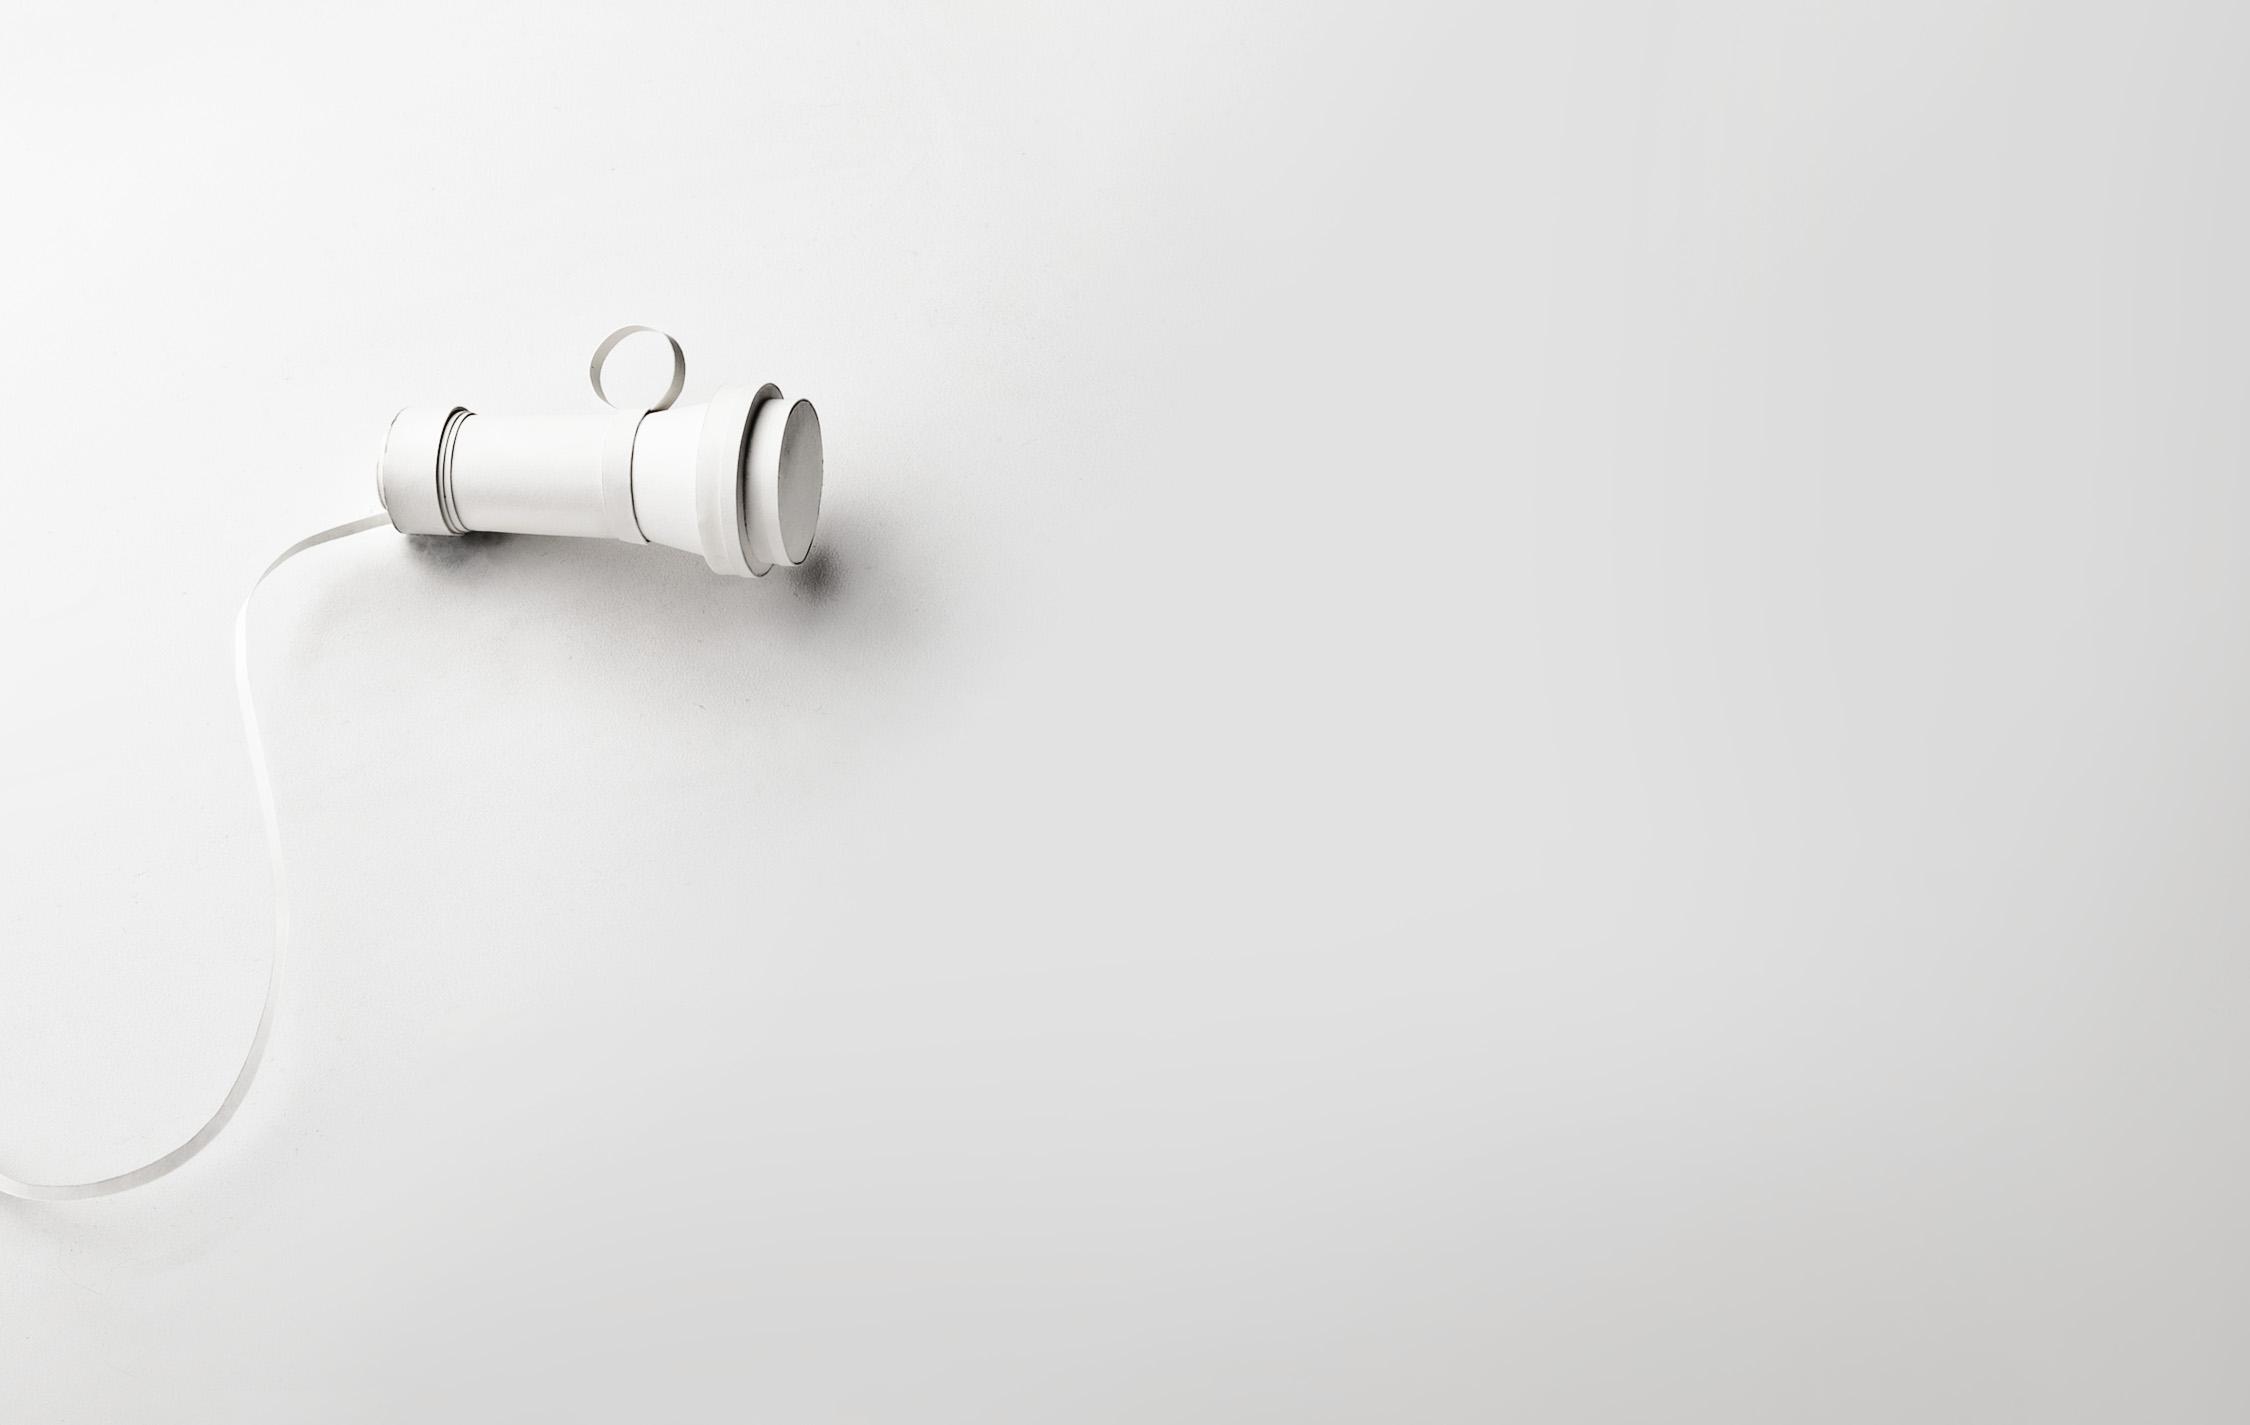 Old-timey ear piece